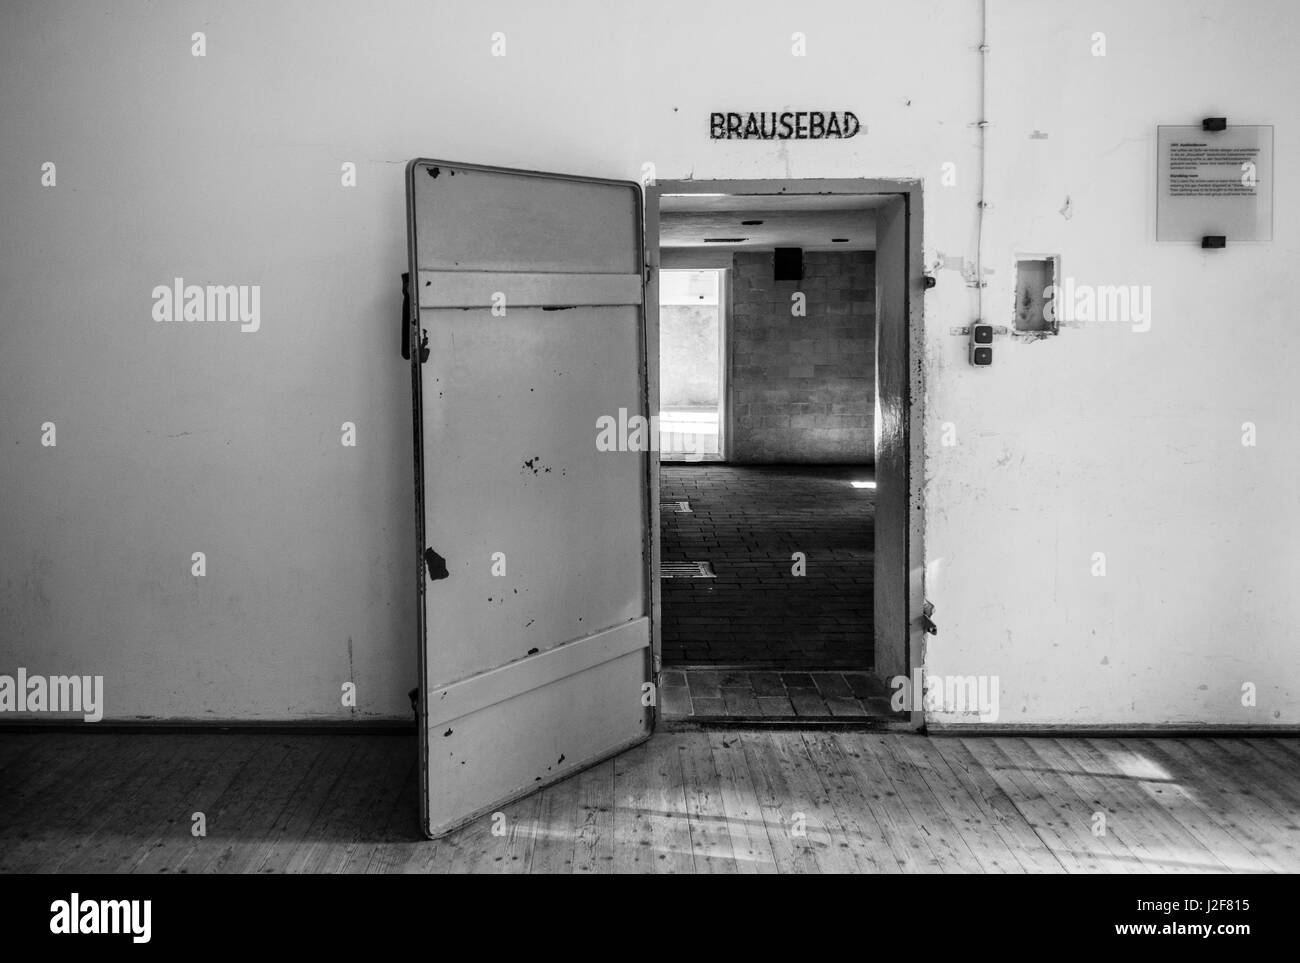 Germany, Bavaria, Munich-Dachau, WW2-era Nazi concentration camp, crematorium building, gas chamber disguised as - Stock Image